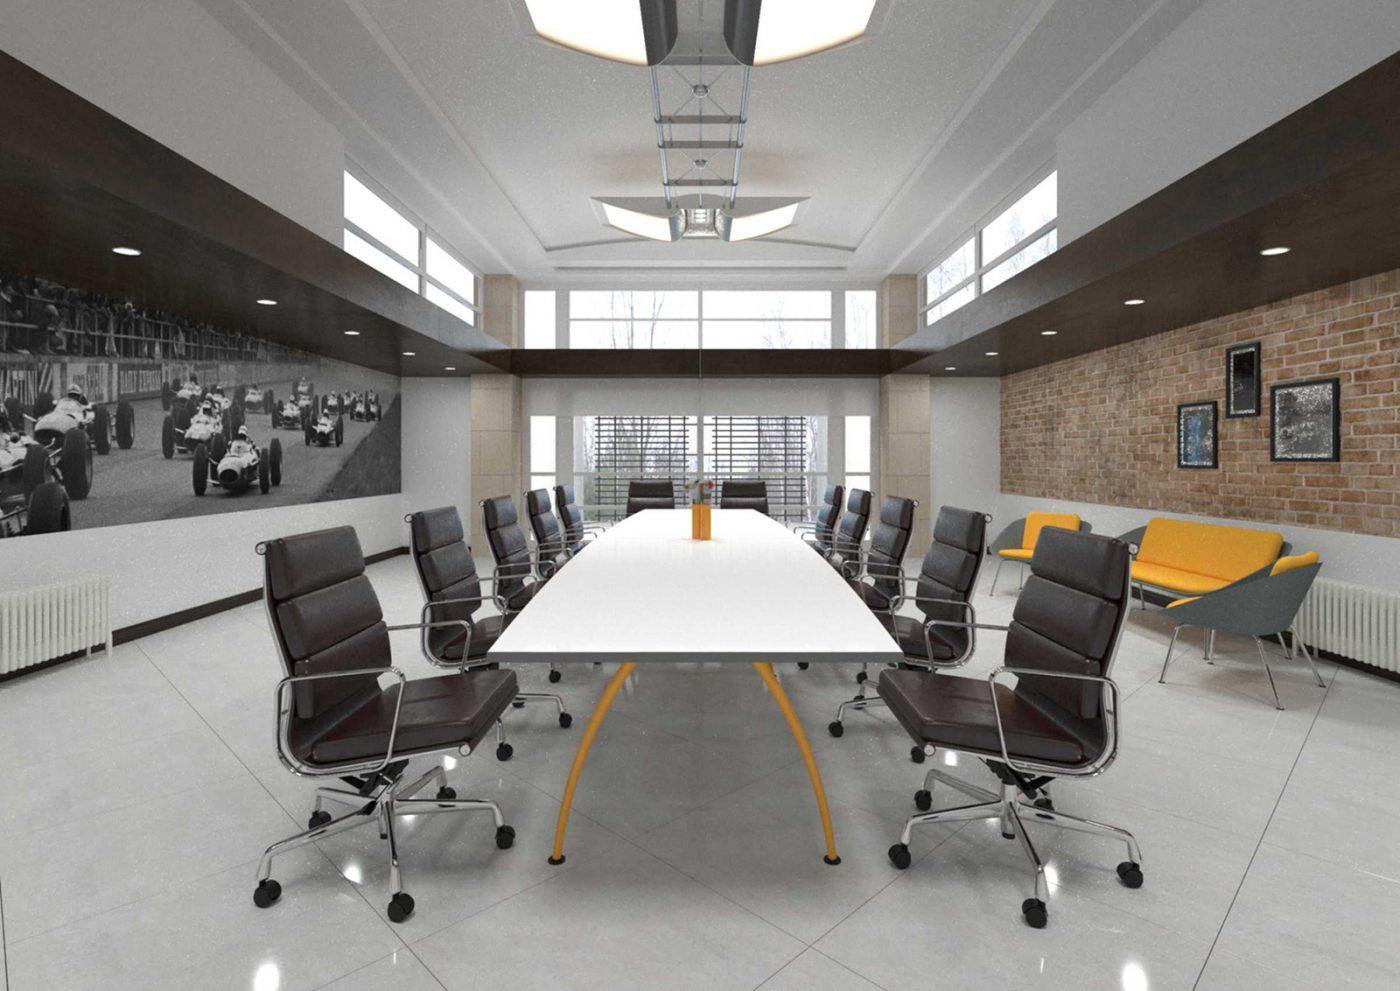 bologna, metal leg, boardroom table, meeting table, executive desk